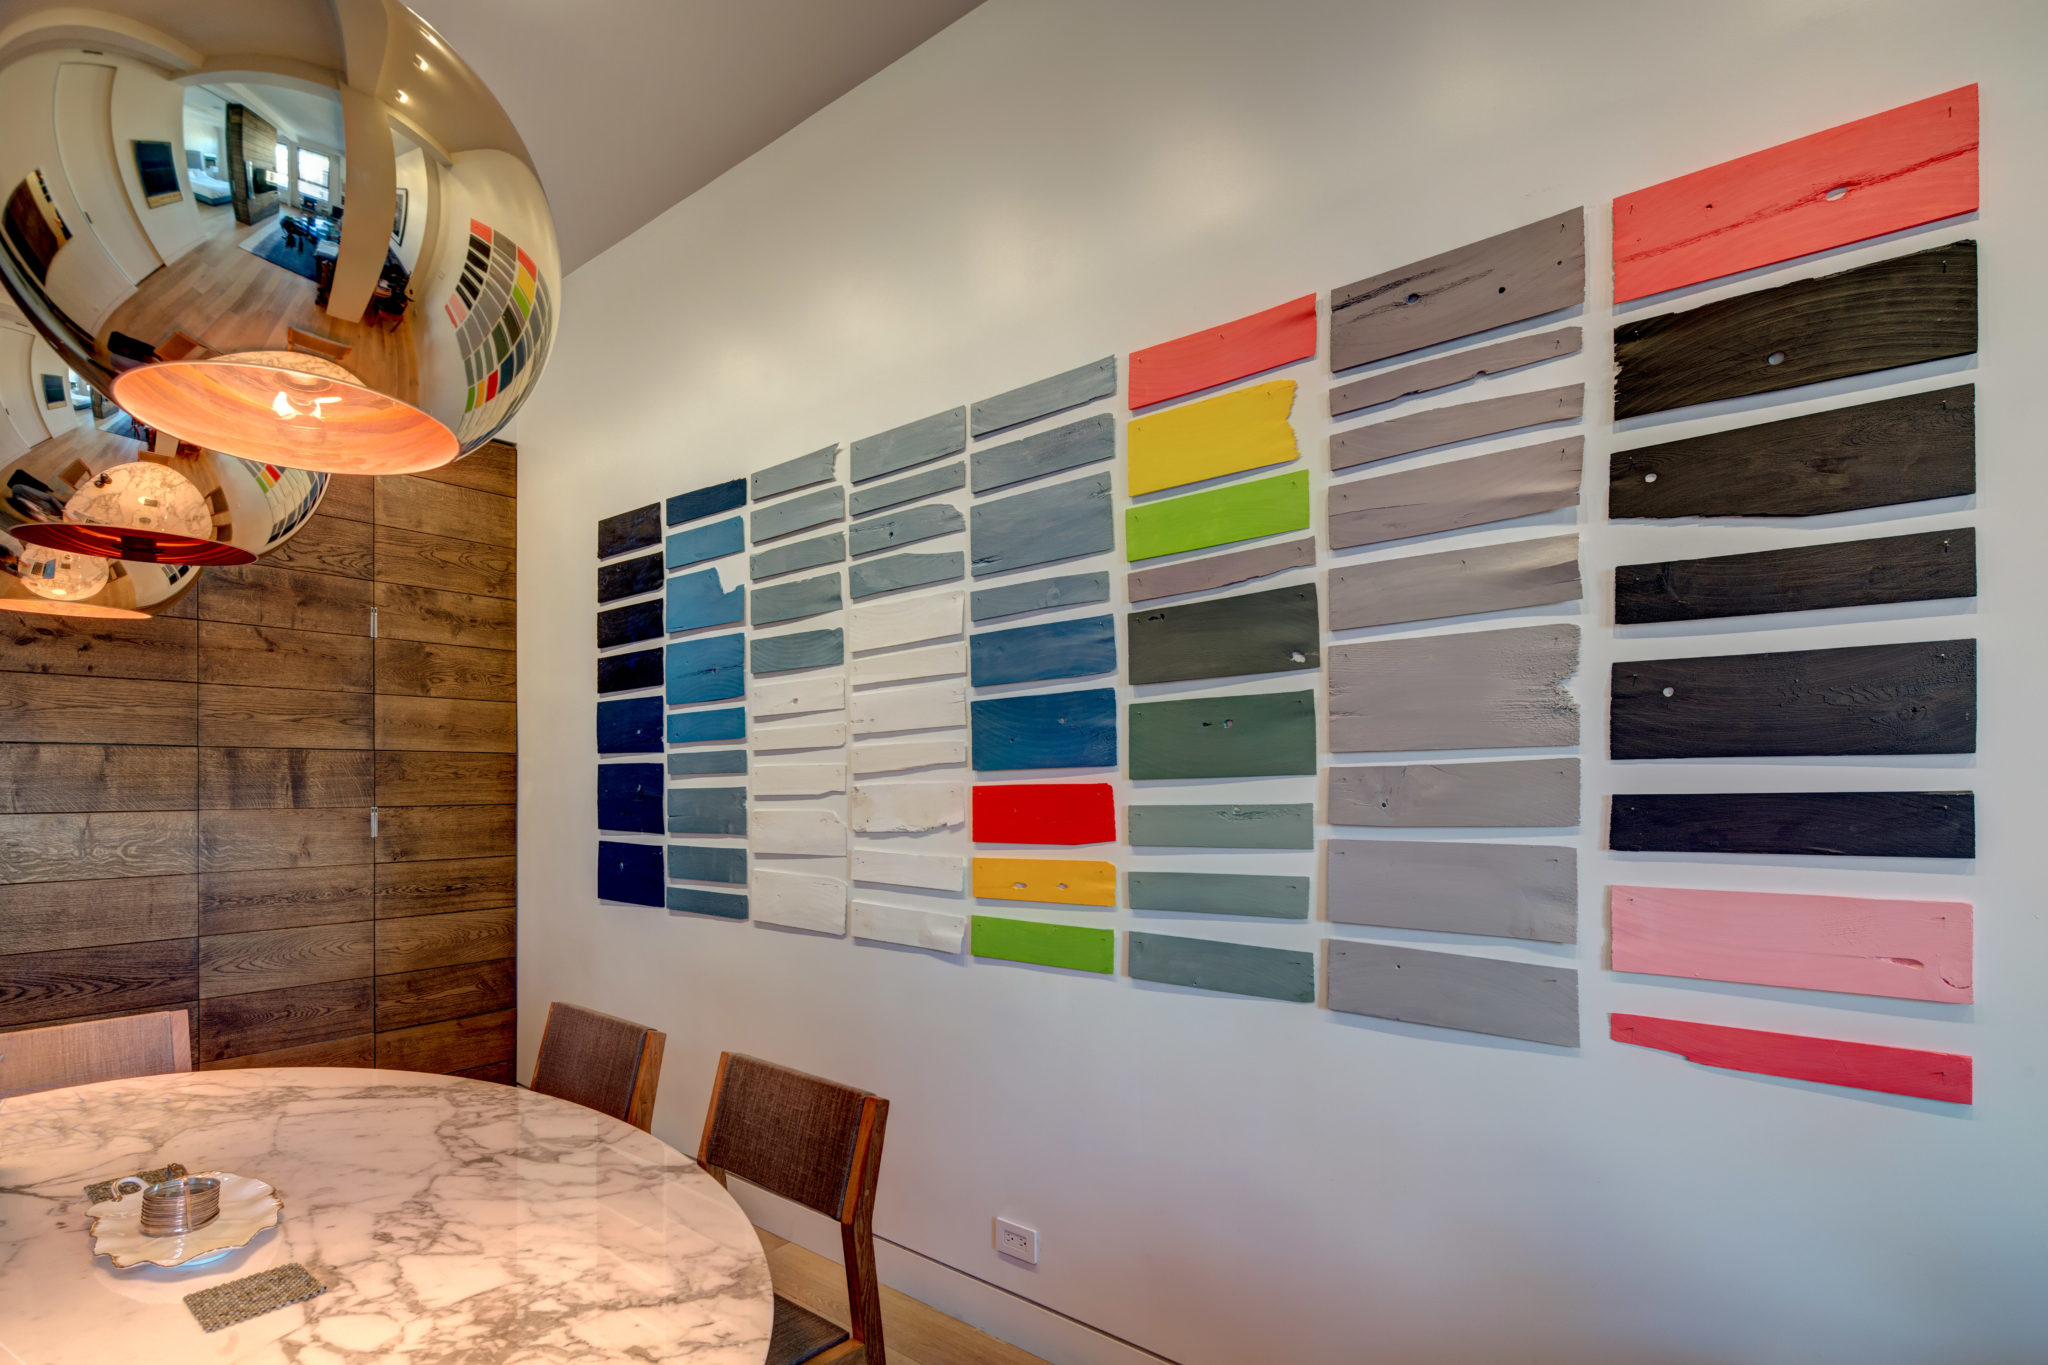 architecture - renovation - design - interior design - danny forster - chelsea mews - 148 west 23rd street - new york